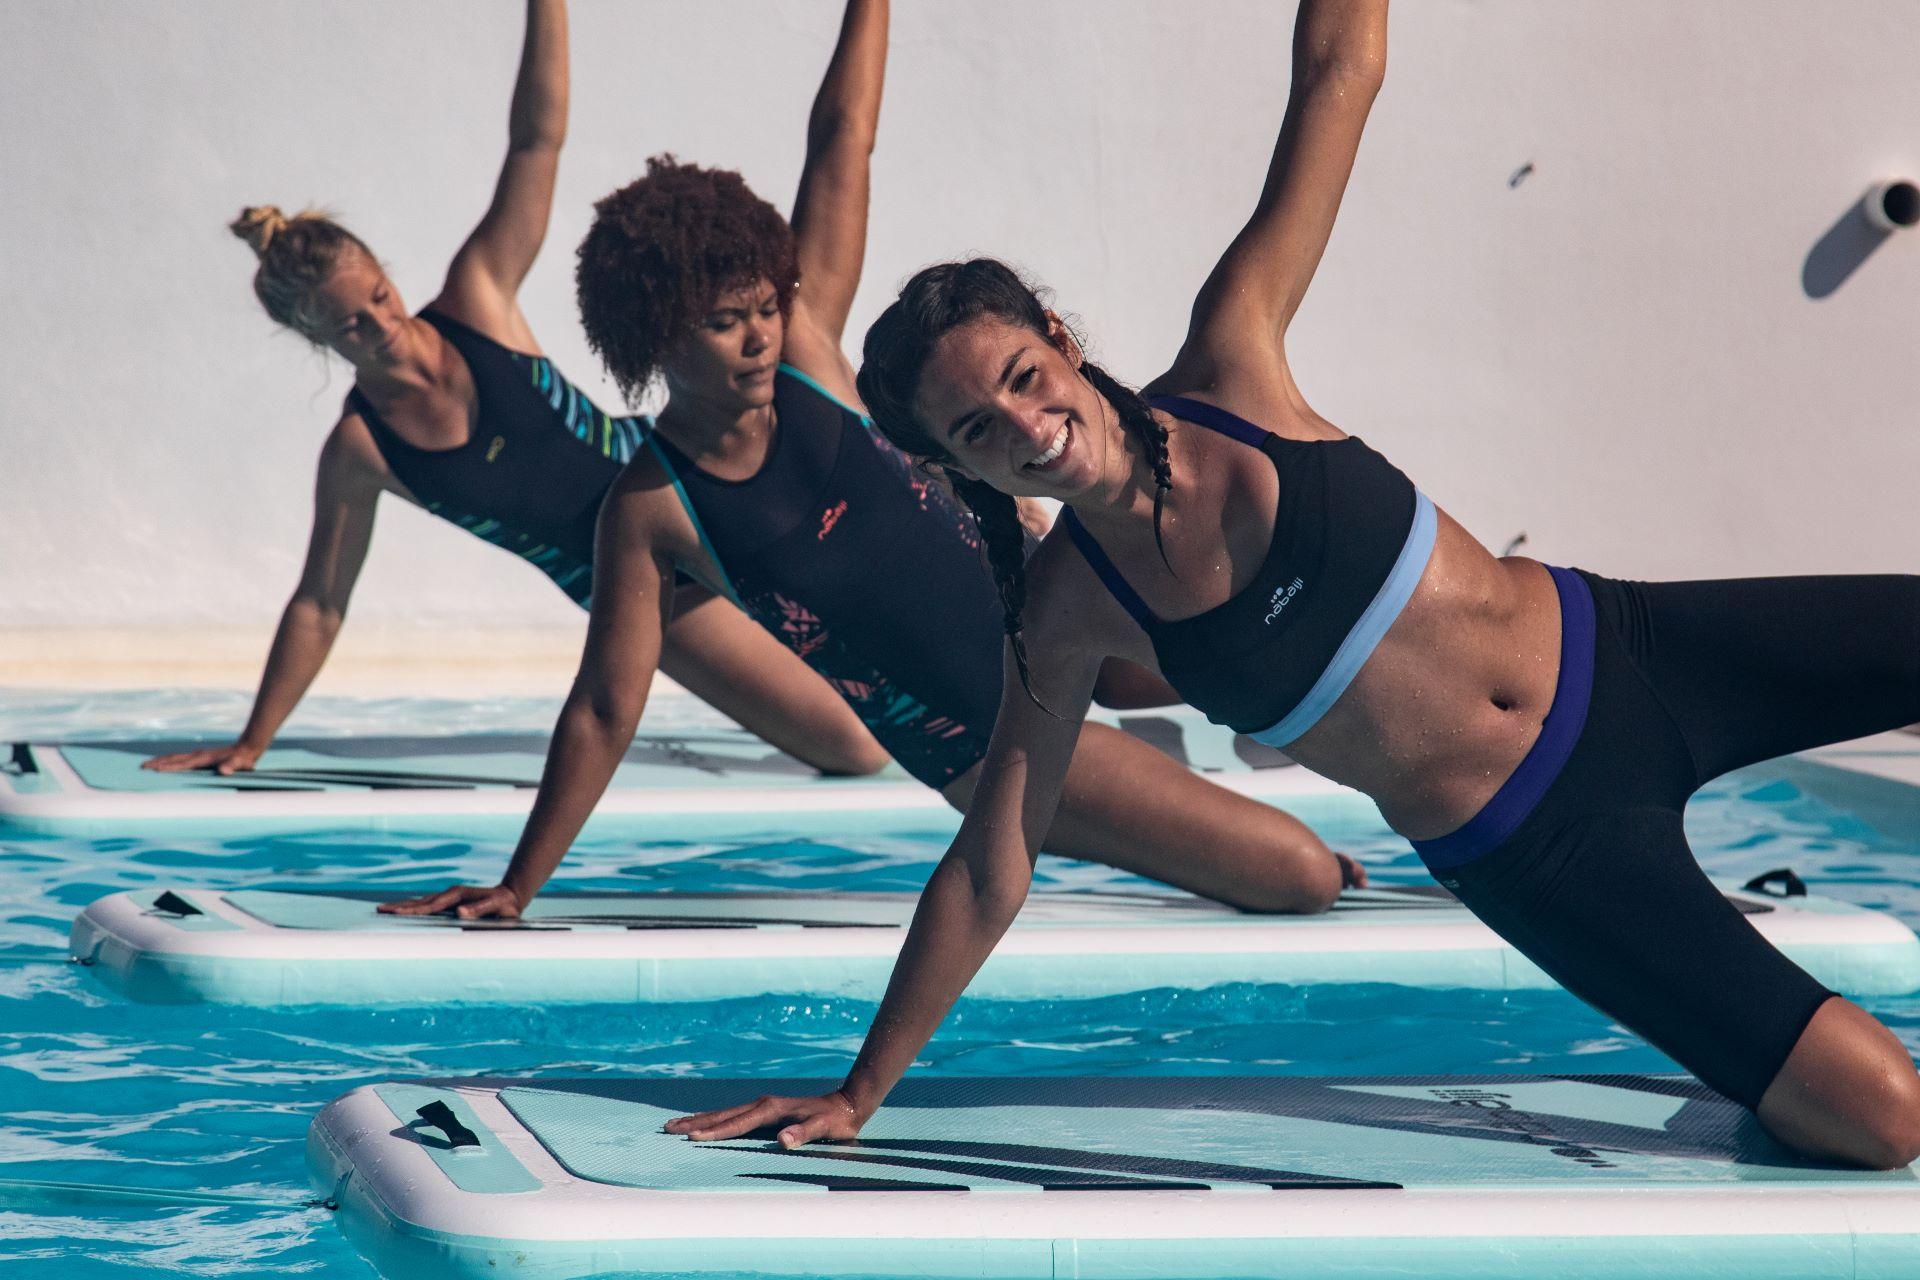 Aqua Fitness Exercises For Anyone